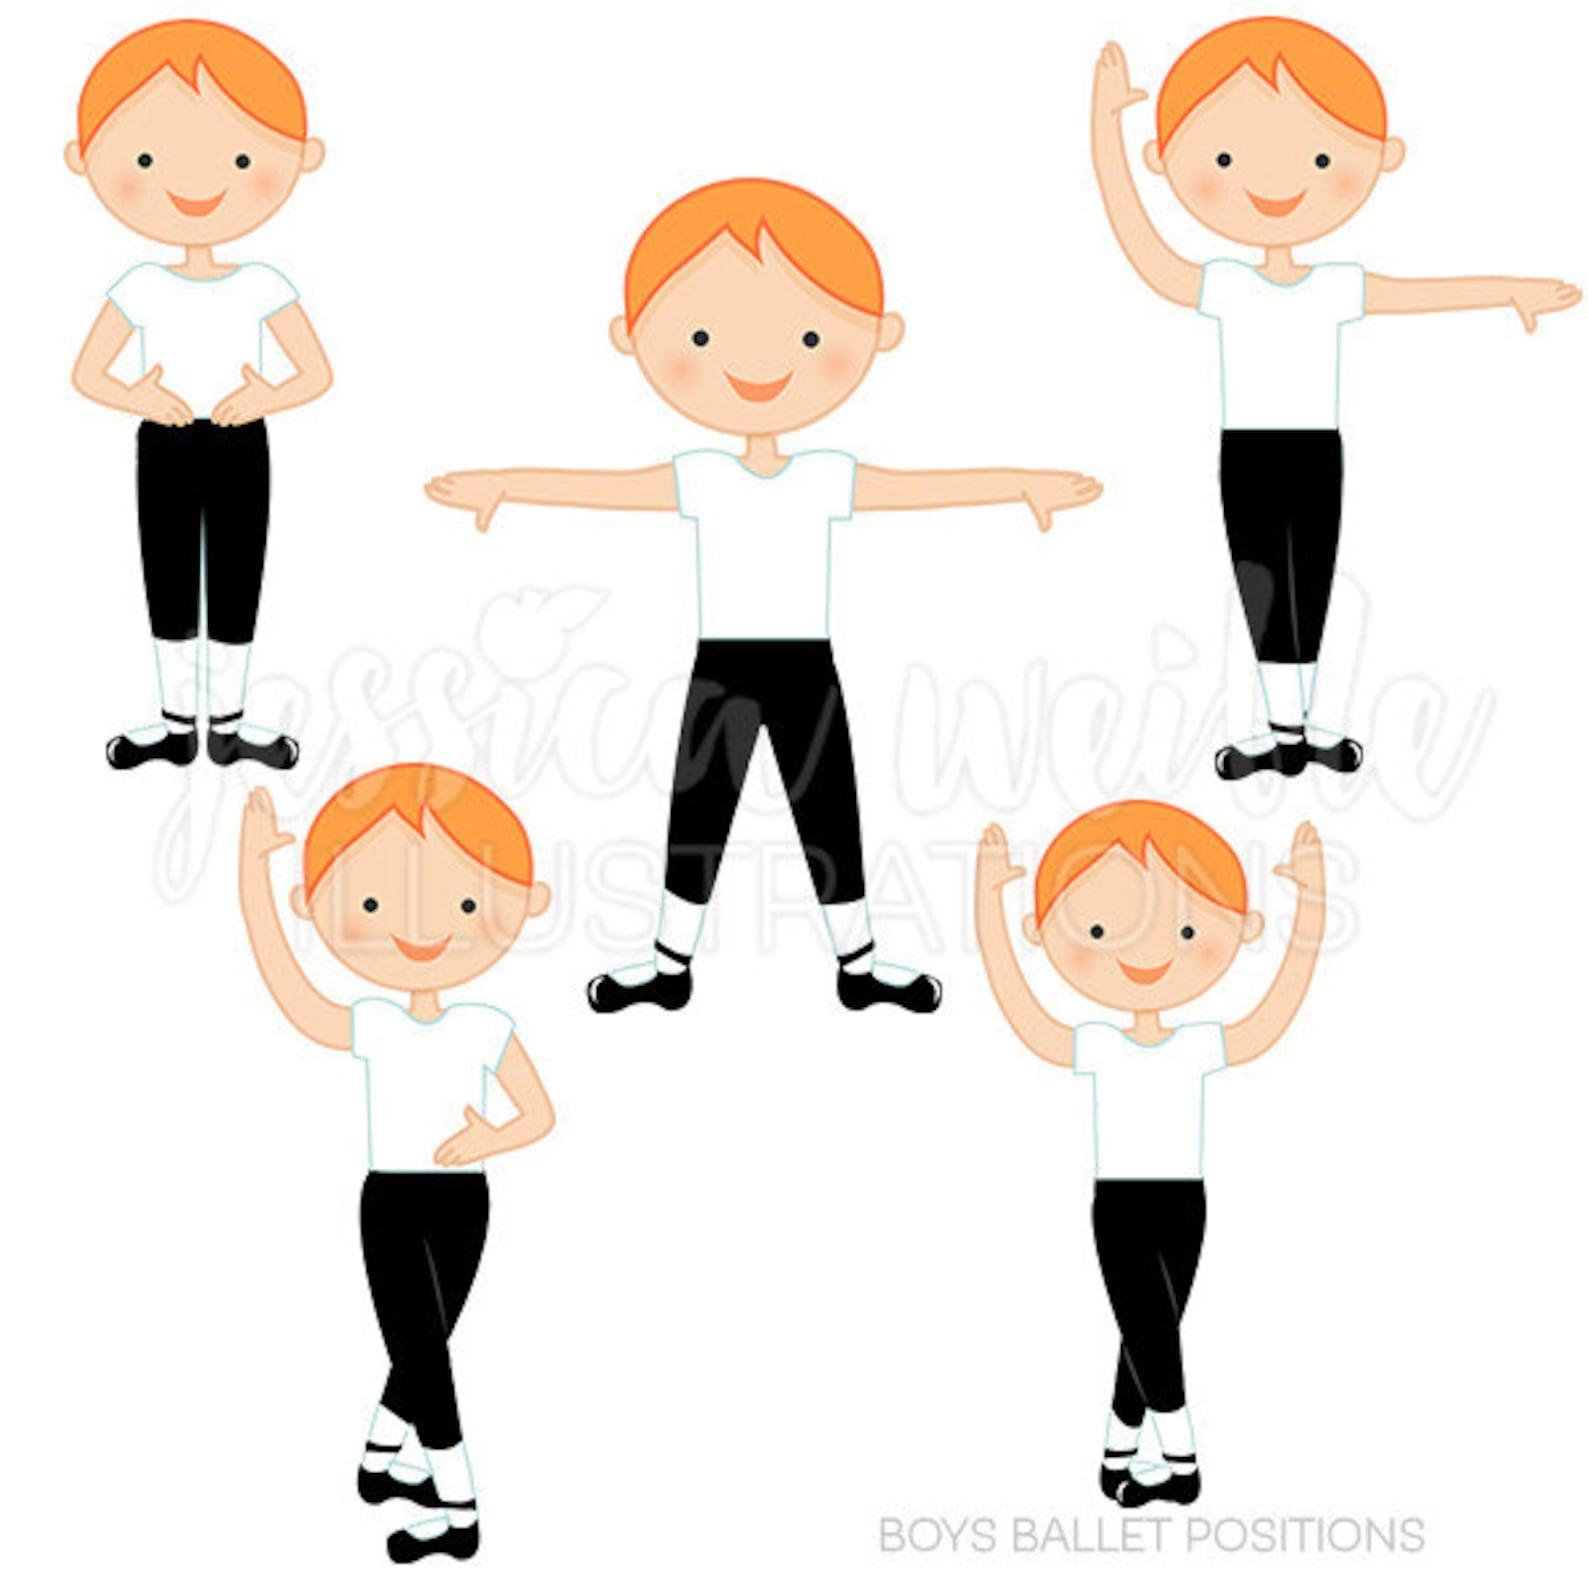 auburn boys ballet positions cute digital clipart, ballerina clip art, ballet graphics, ballet positions, instant download, ball